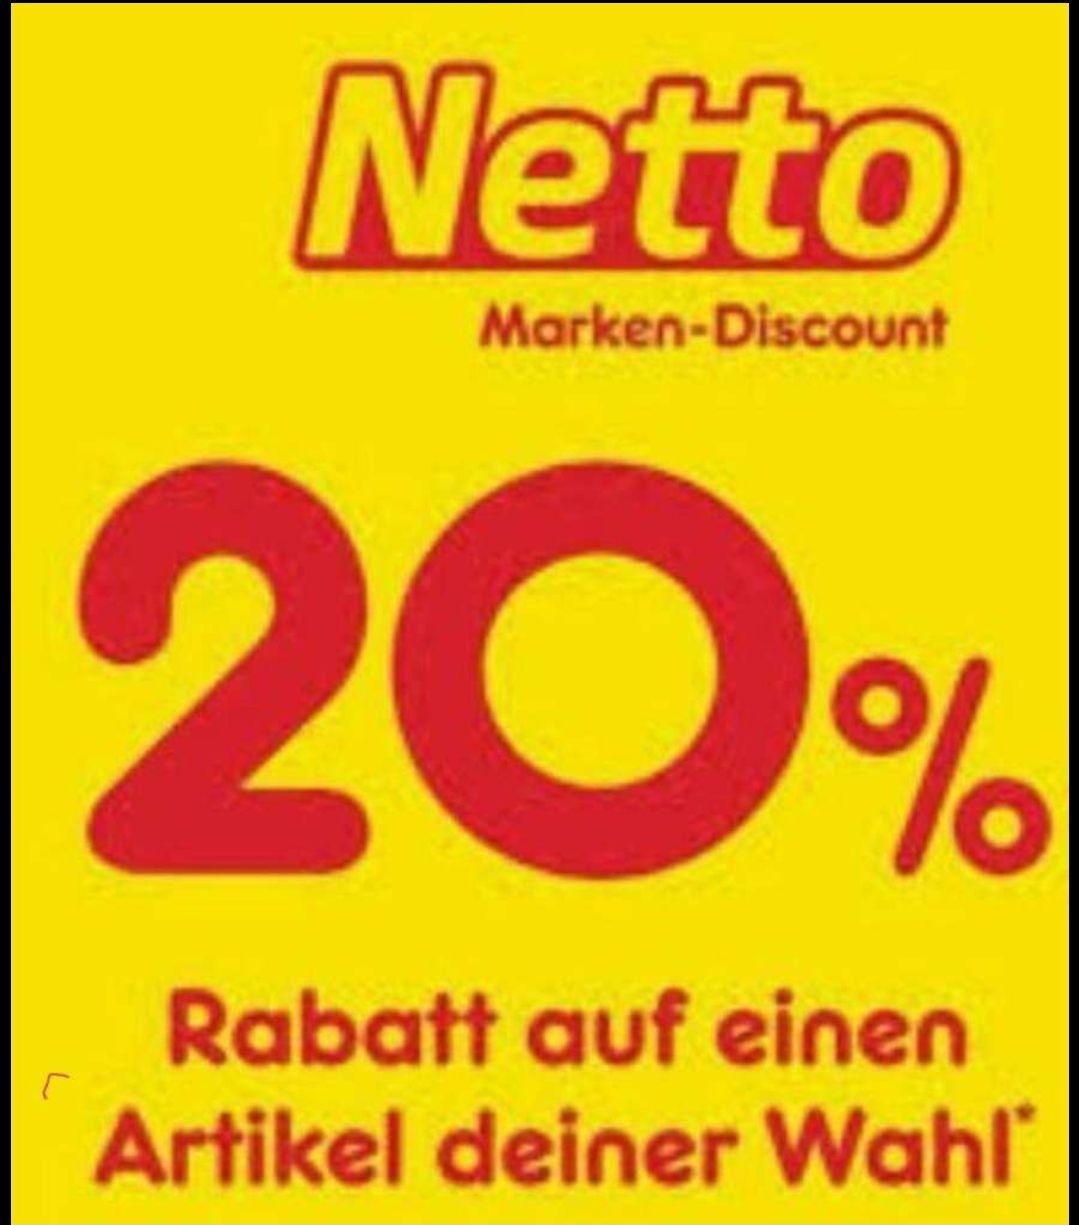 [Netto MD] Rabatt Coupons KW20 (17.05. - 22.05.), bundesweit einsetzbar